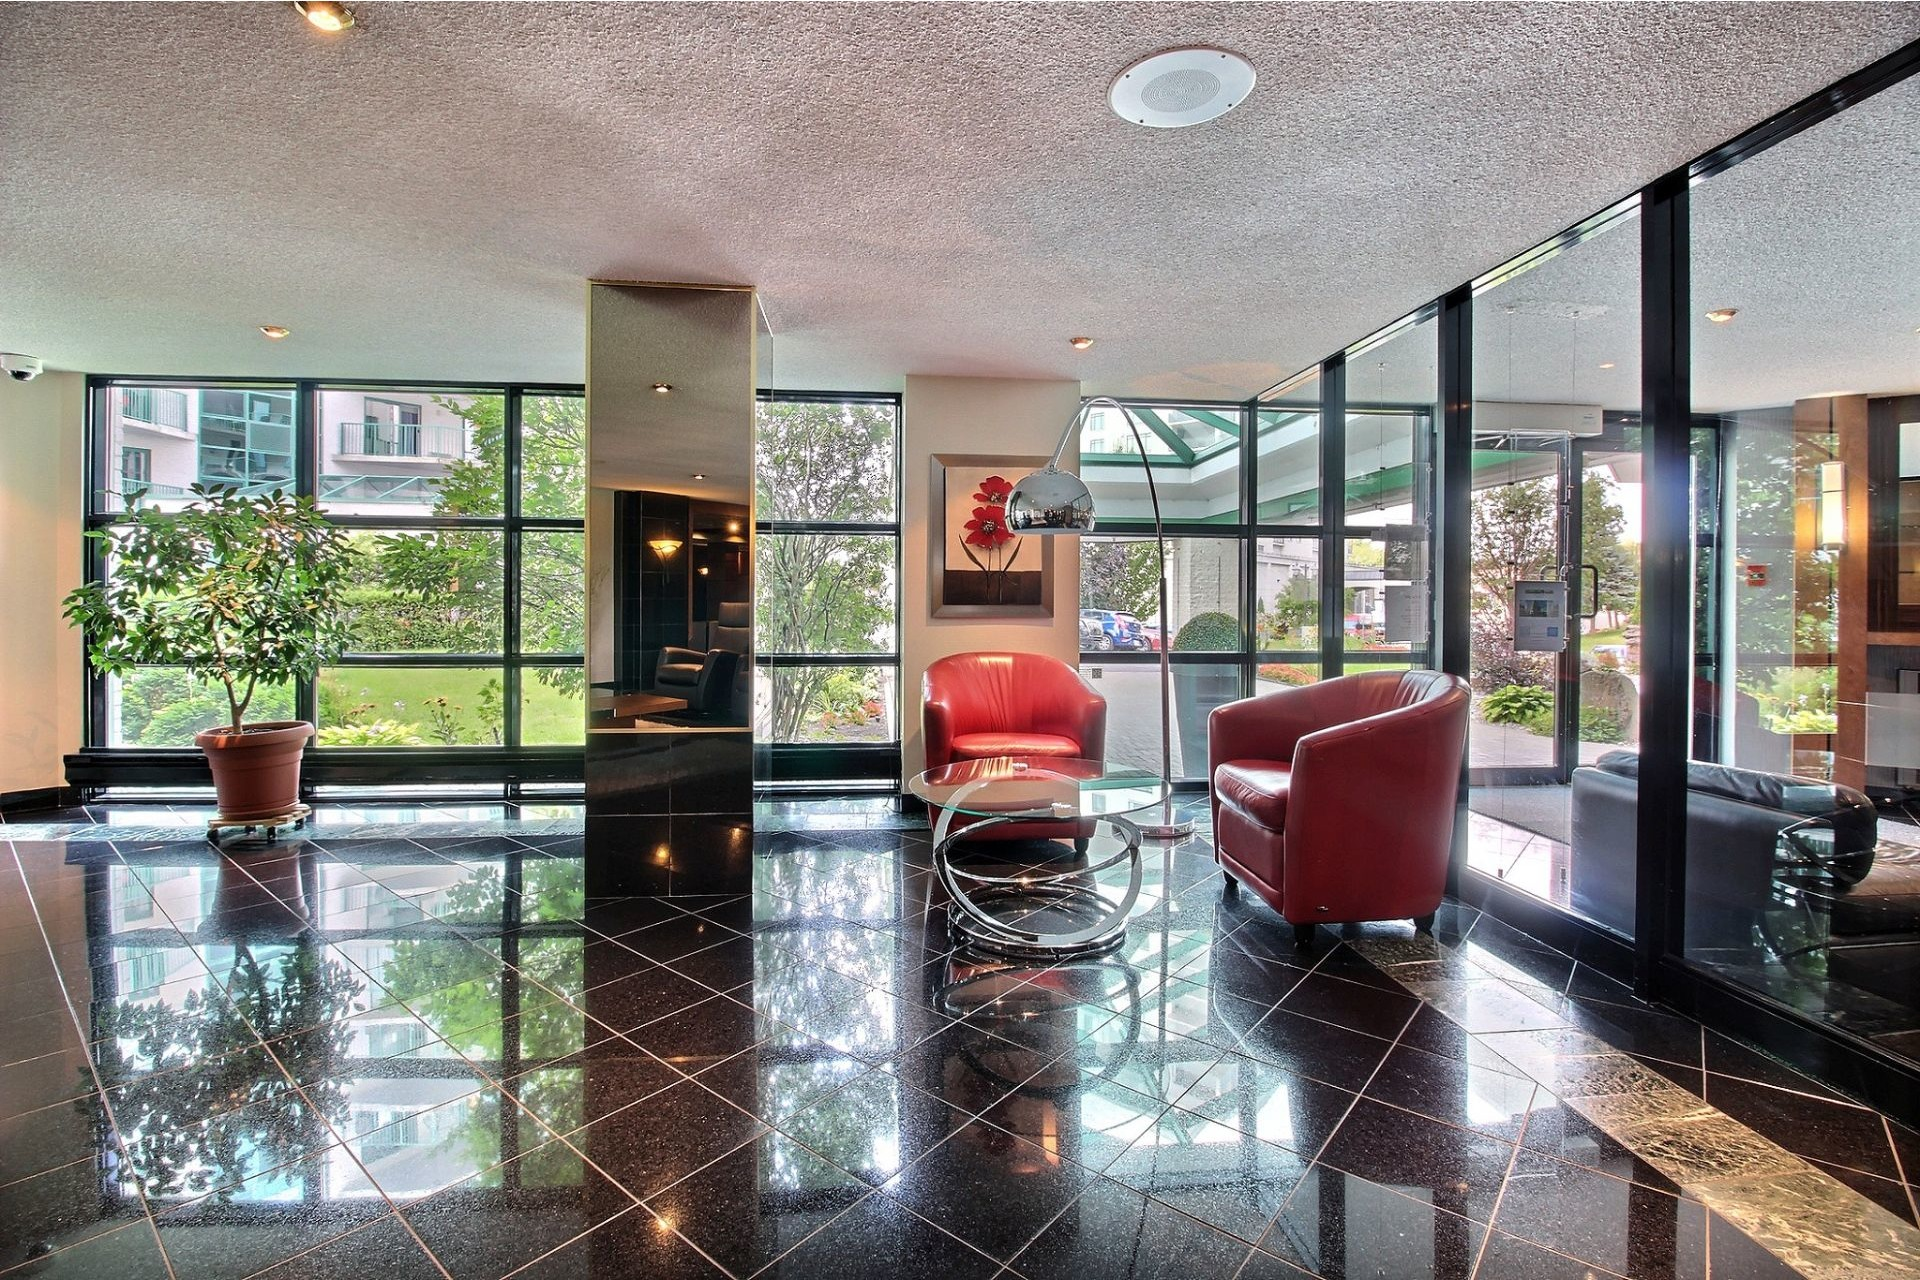 image 25 - Appartement À vendre Repentigny Repentigny  - 7 pièces